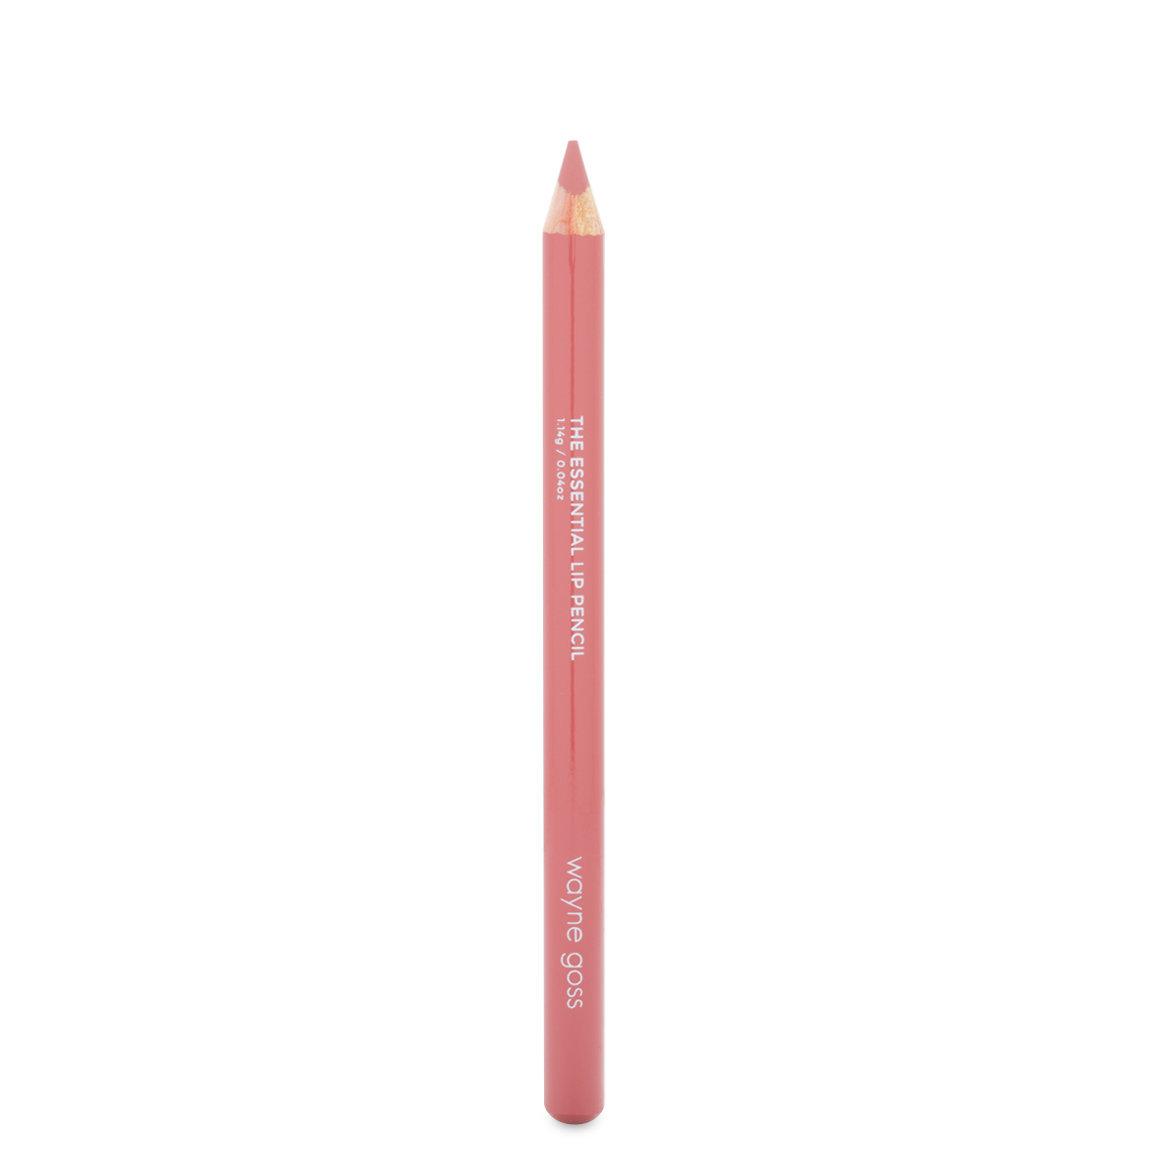 Wayne Goss The Essential Lip Pencil Natural Berry alternative view 1.